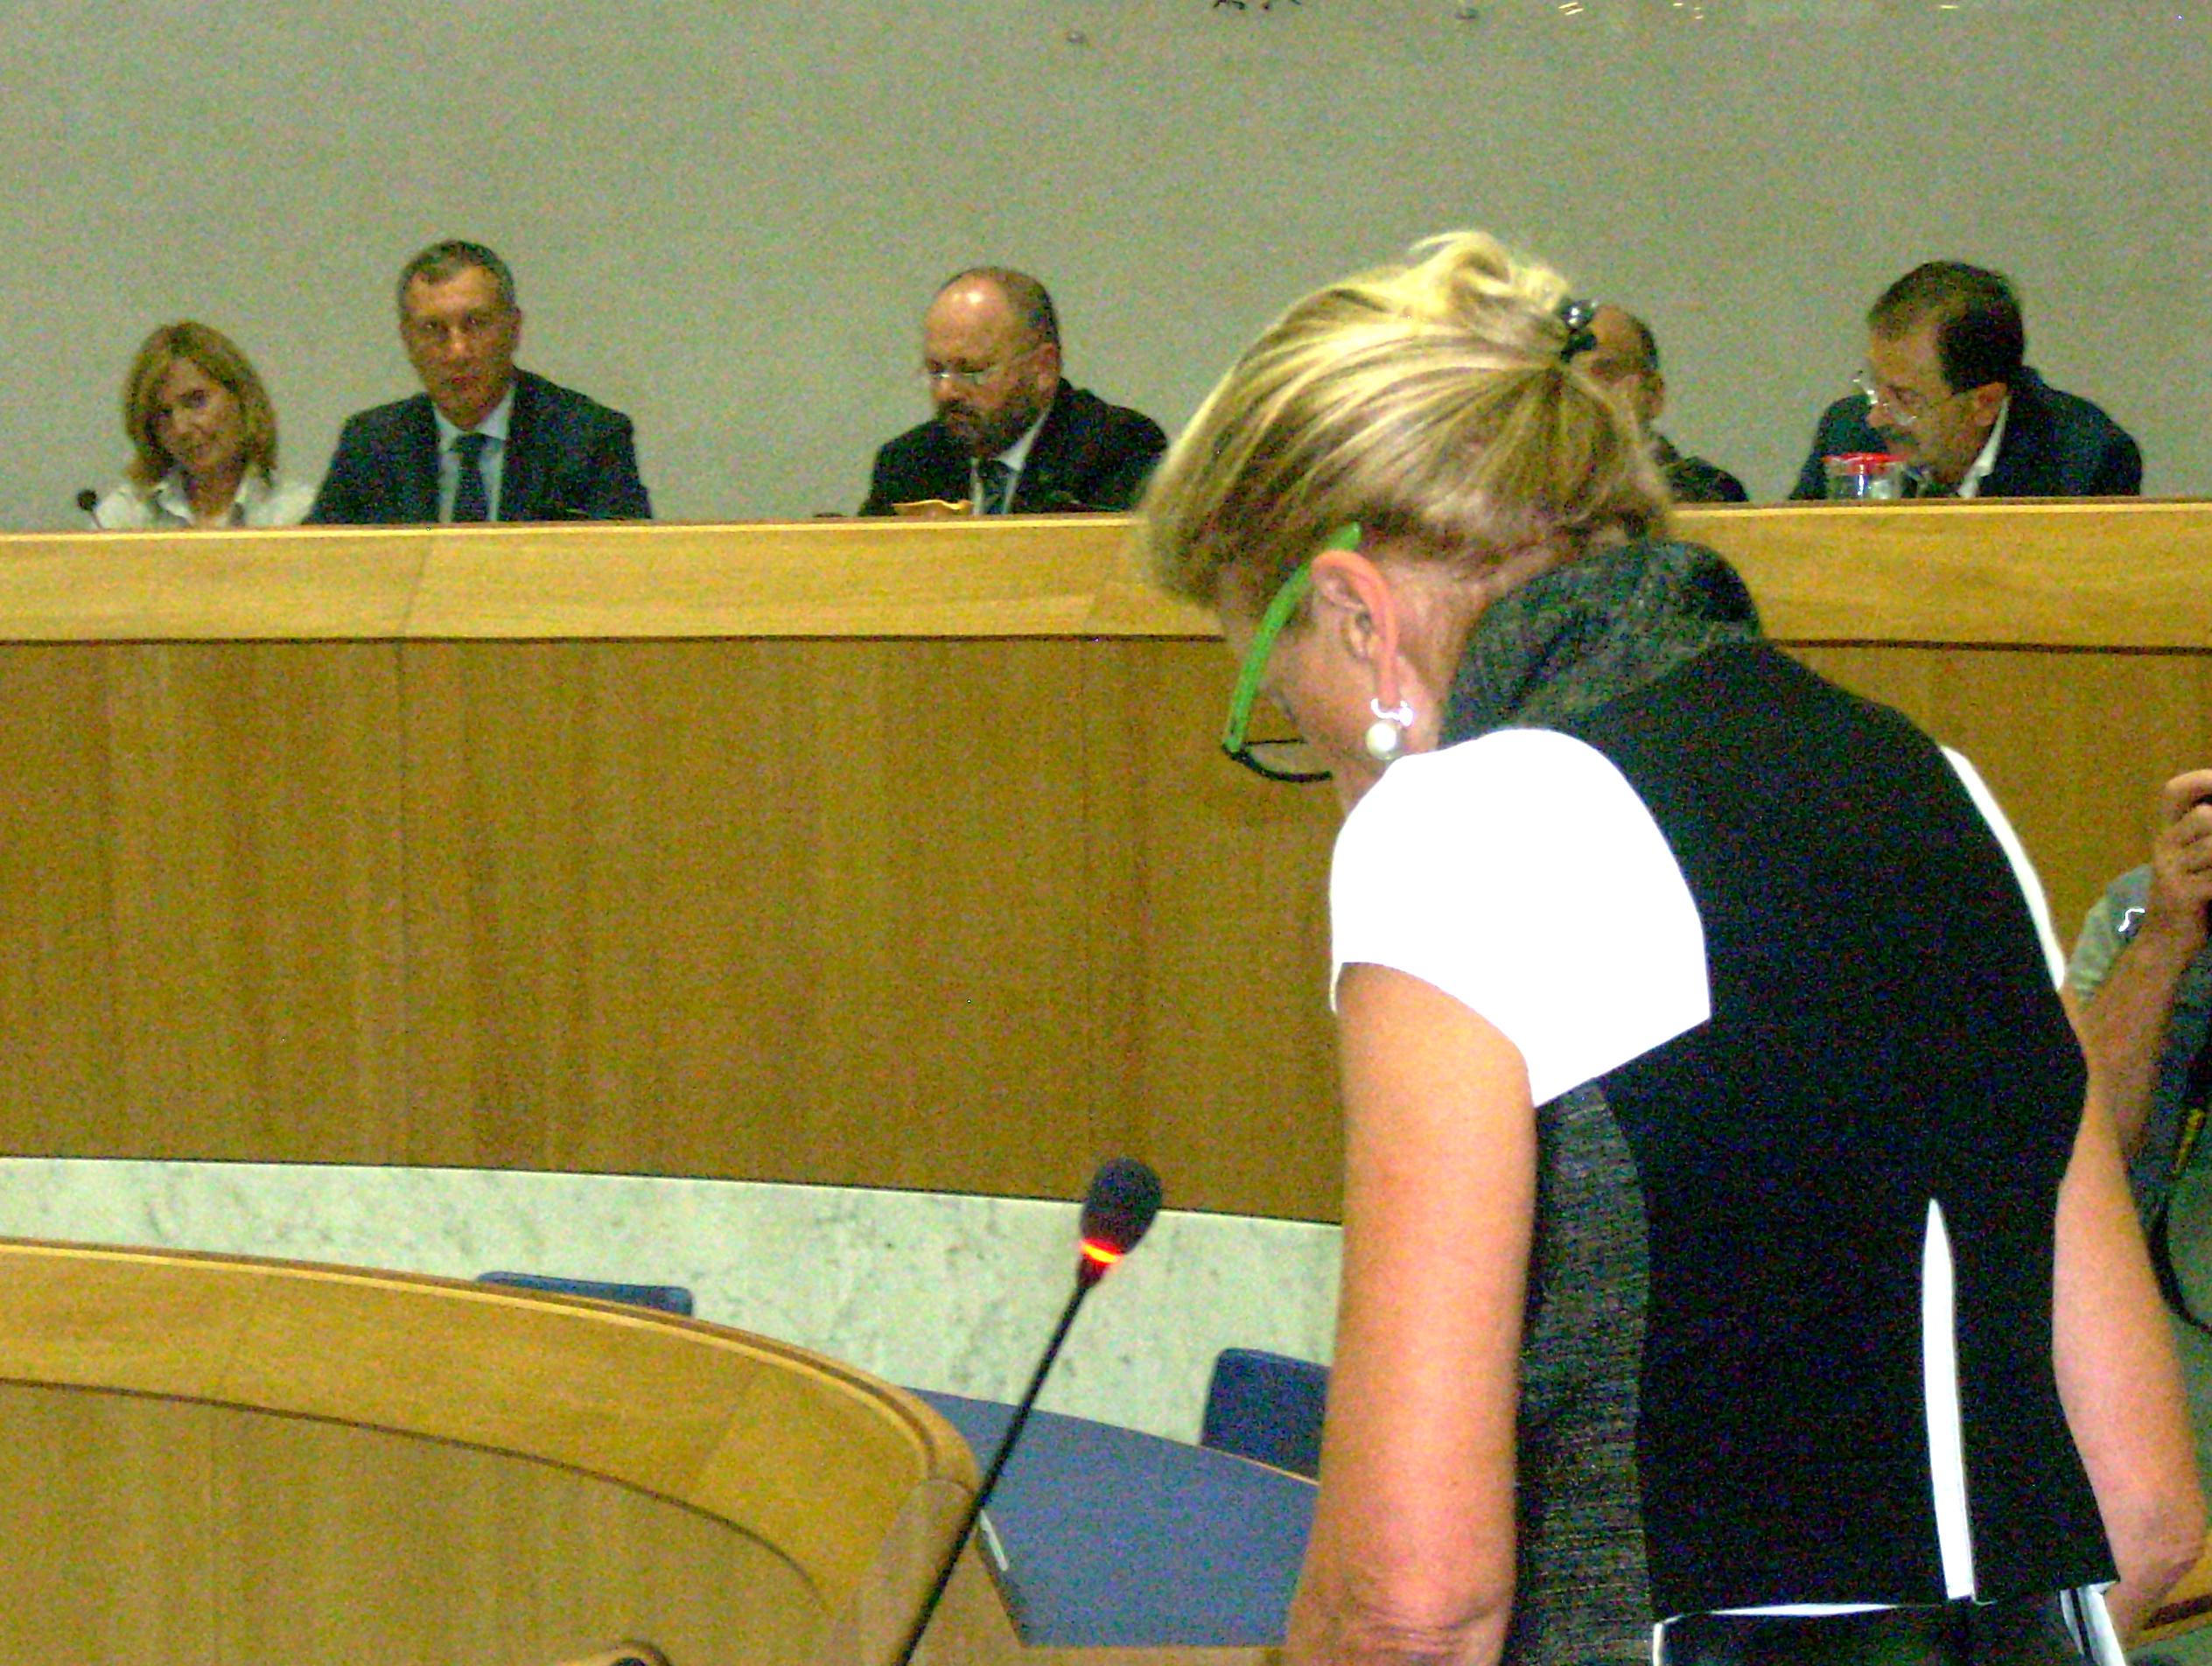 Consiglio Comunale, Loredana Emili